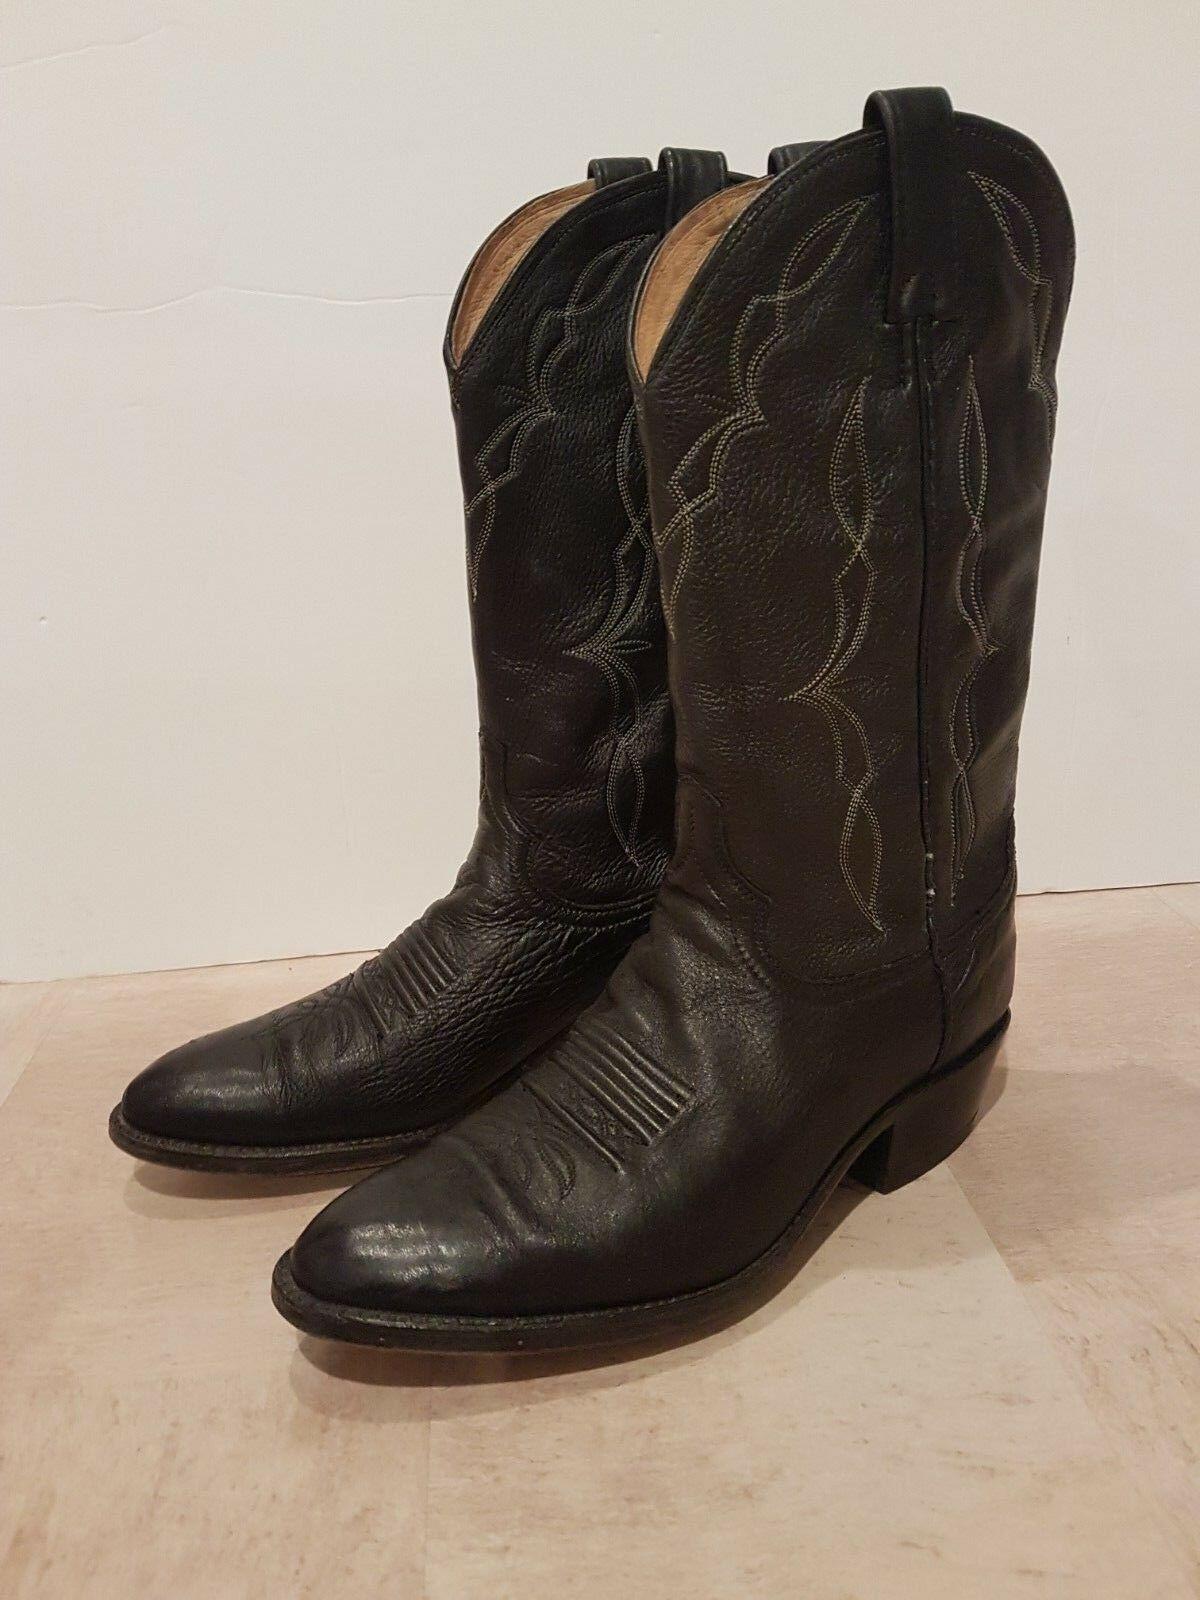 Vintage schwarz Leder Dan Post cowboy / cowgirl / / / western Stiefel UK Größe 8 a7c711